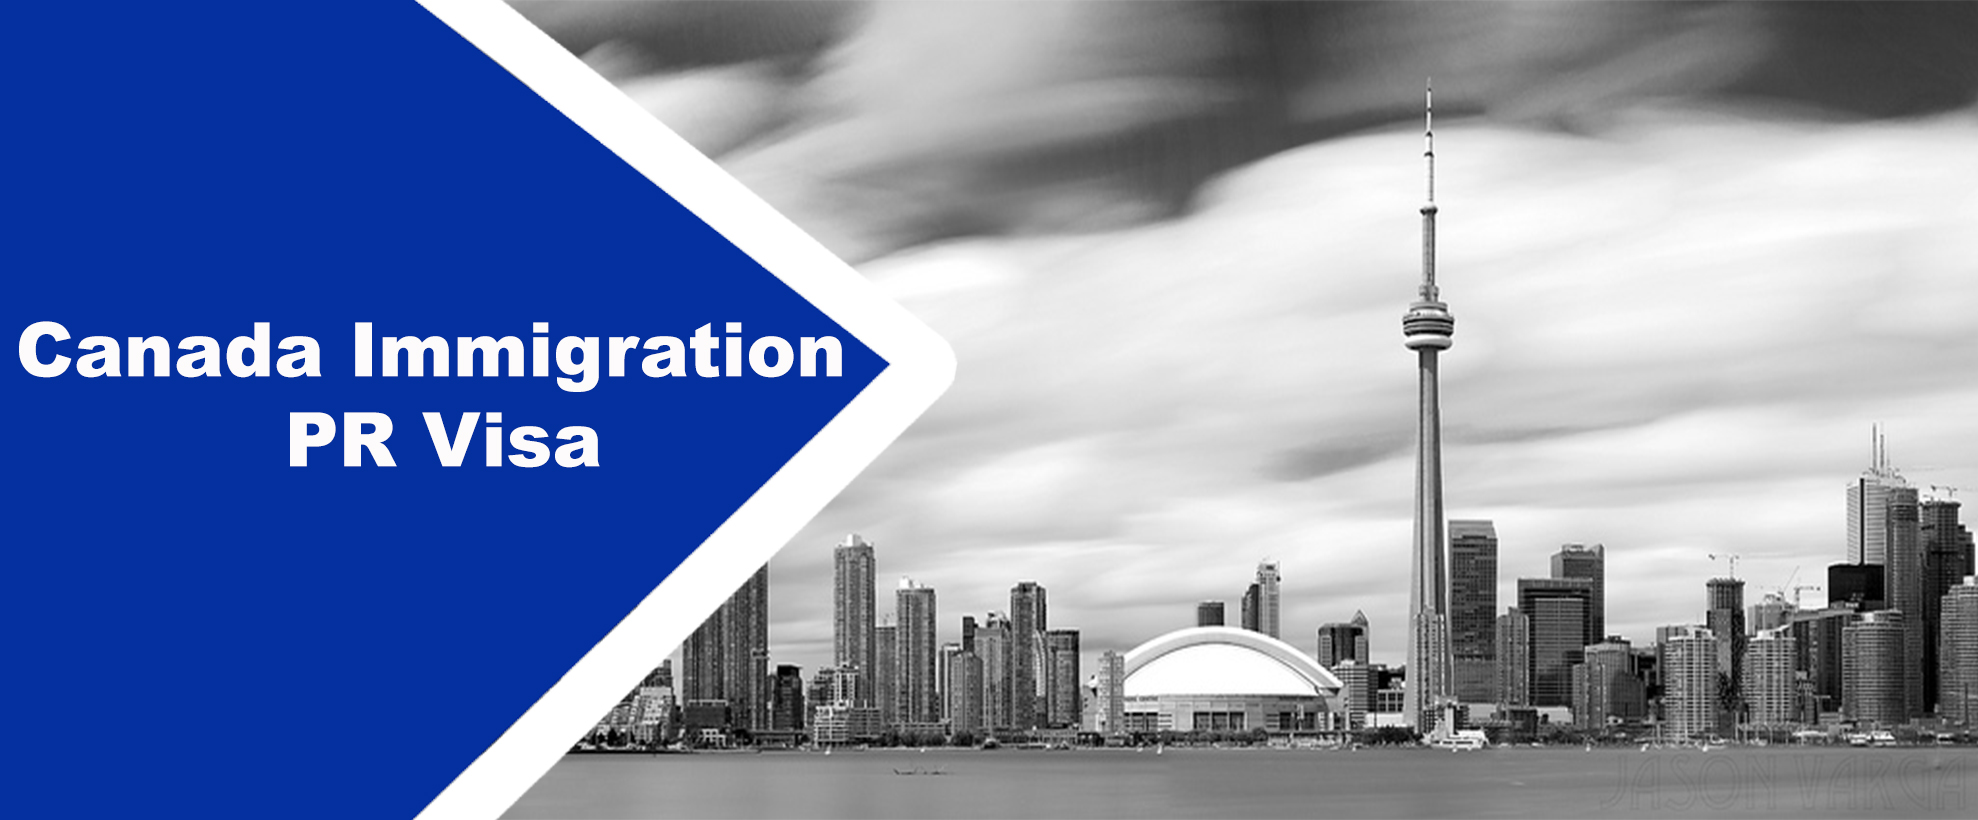 Canada immigration visa top immigration and visa consultancy services in india - Bureau immigration canada ...